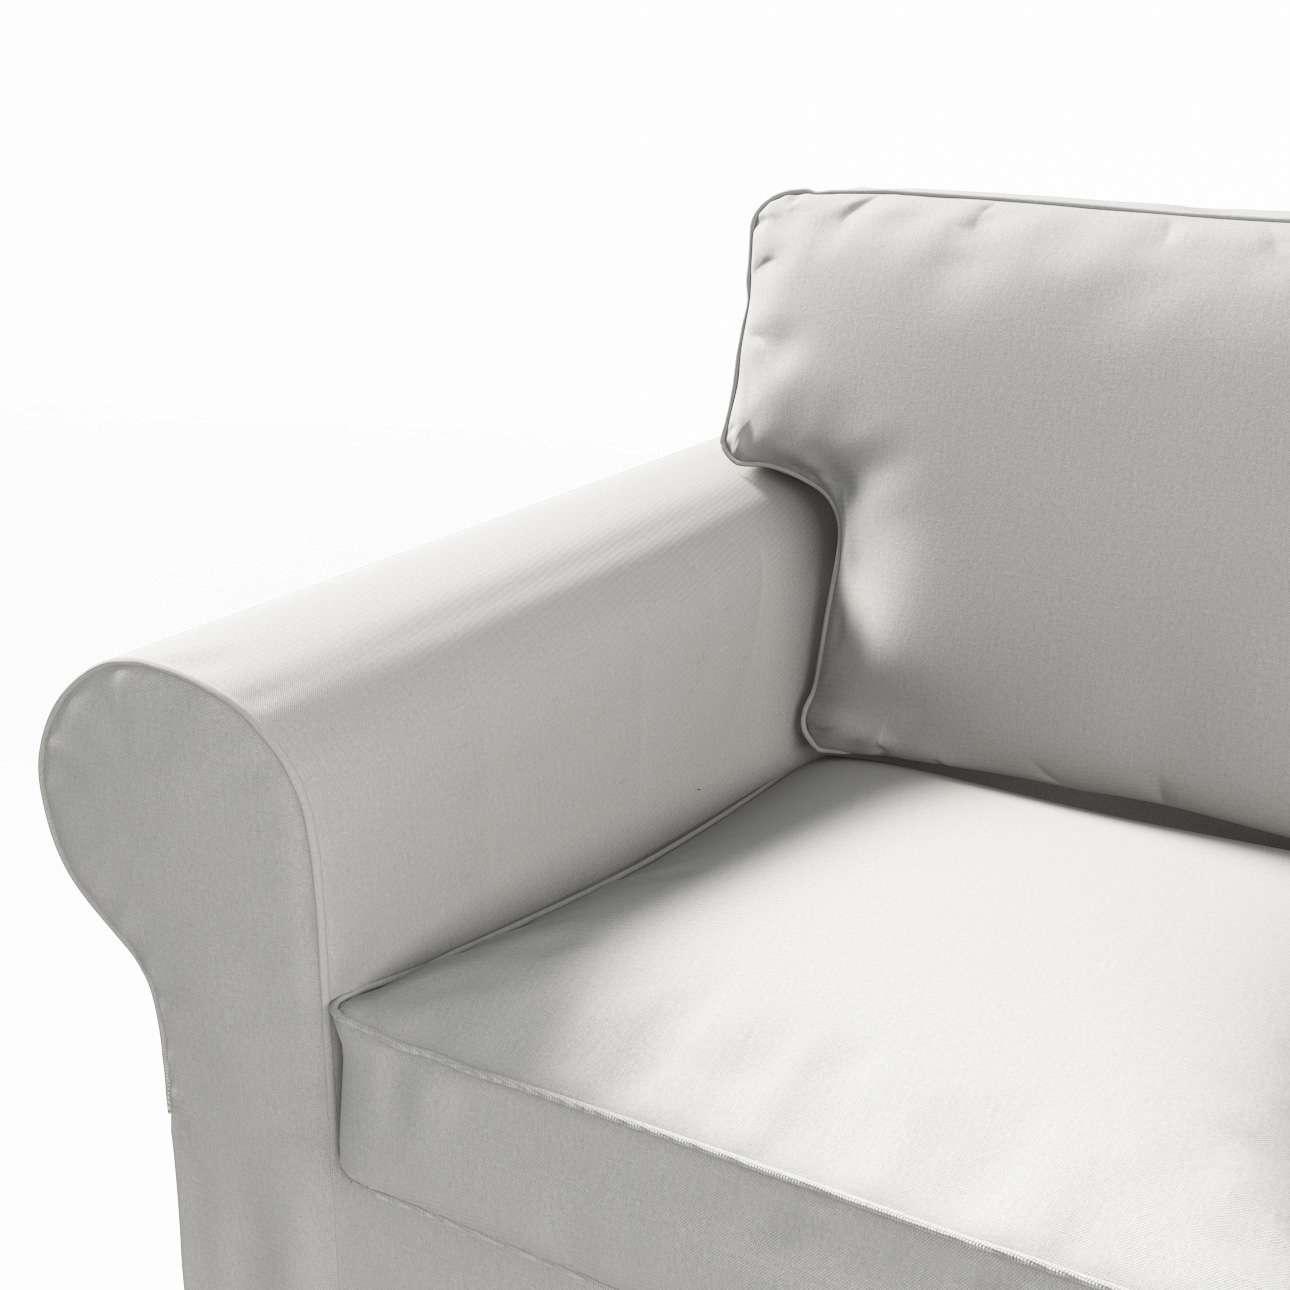 Ektorp 2 sæder sovesofa fra 2012<br/>Bredde ca 200cm fra kollektionen Etna, Stof: 705-90